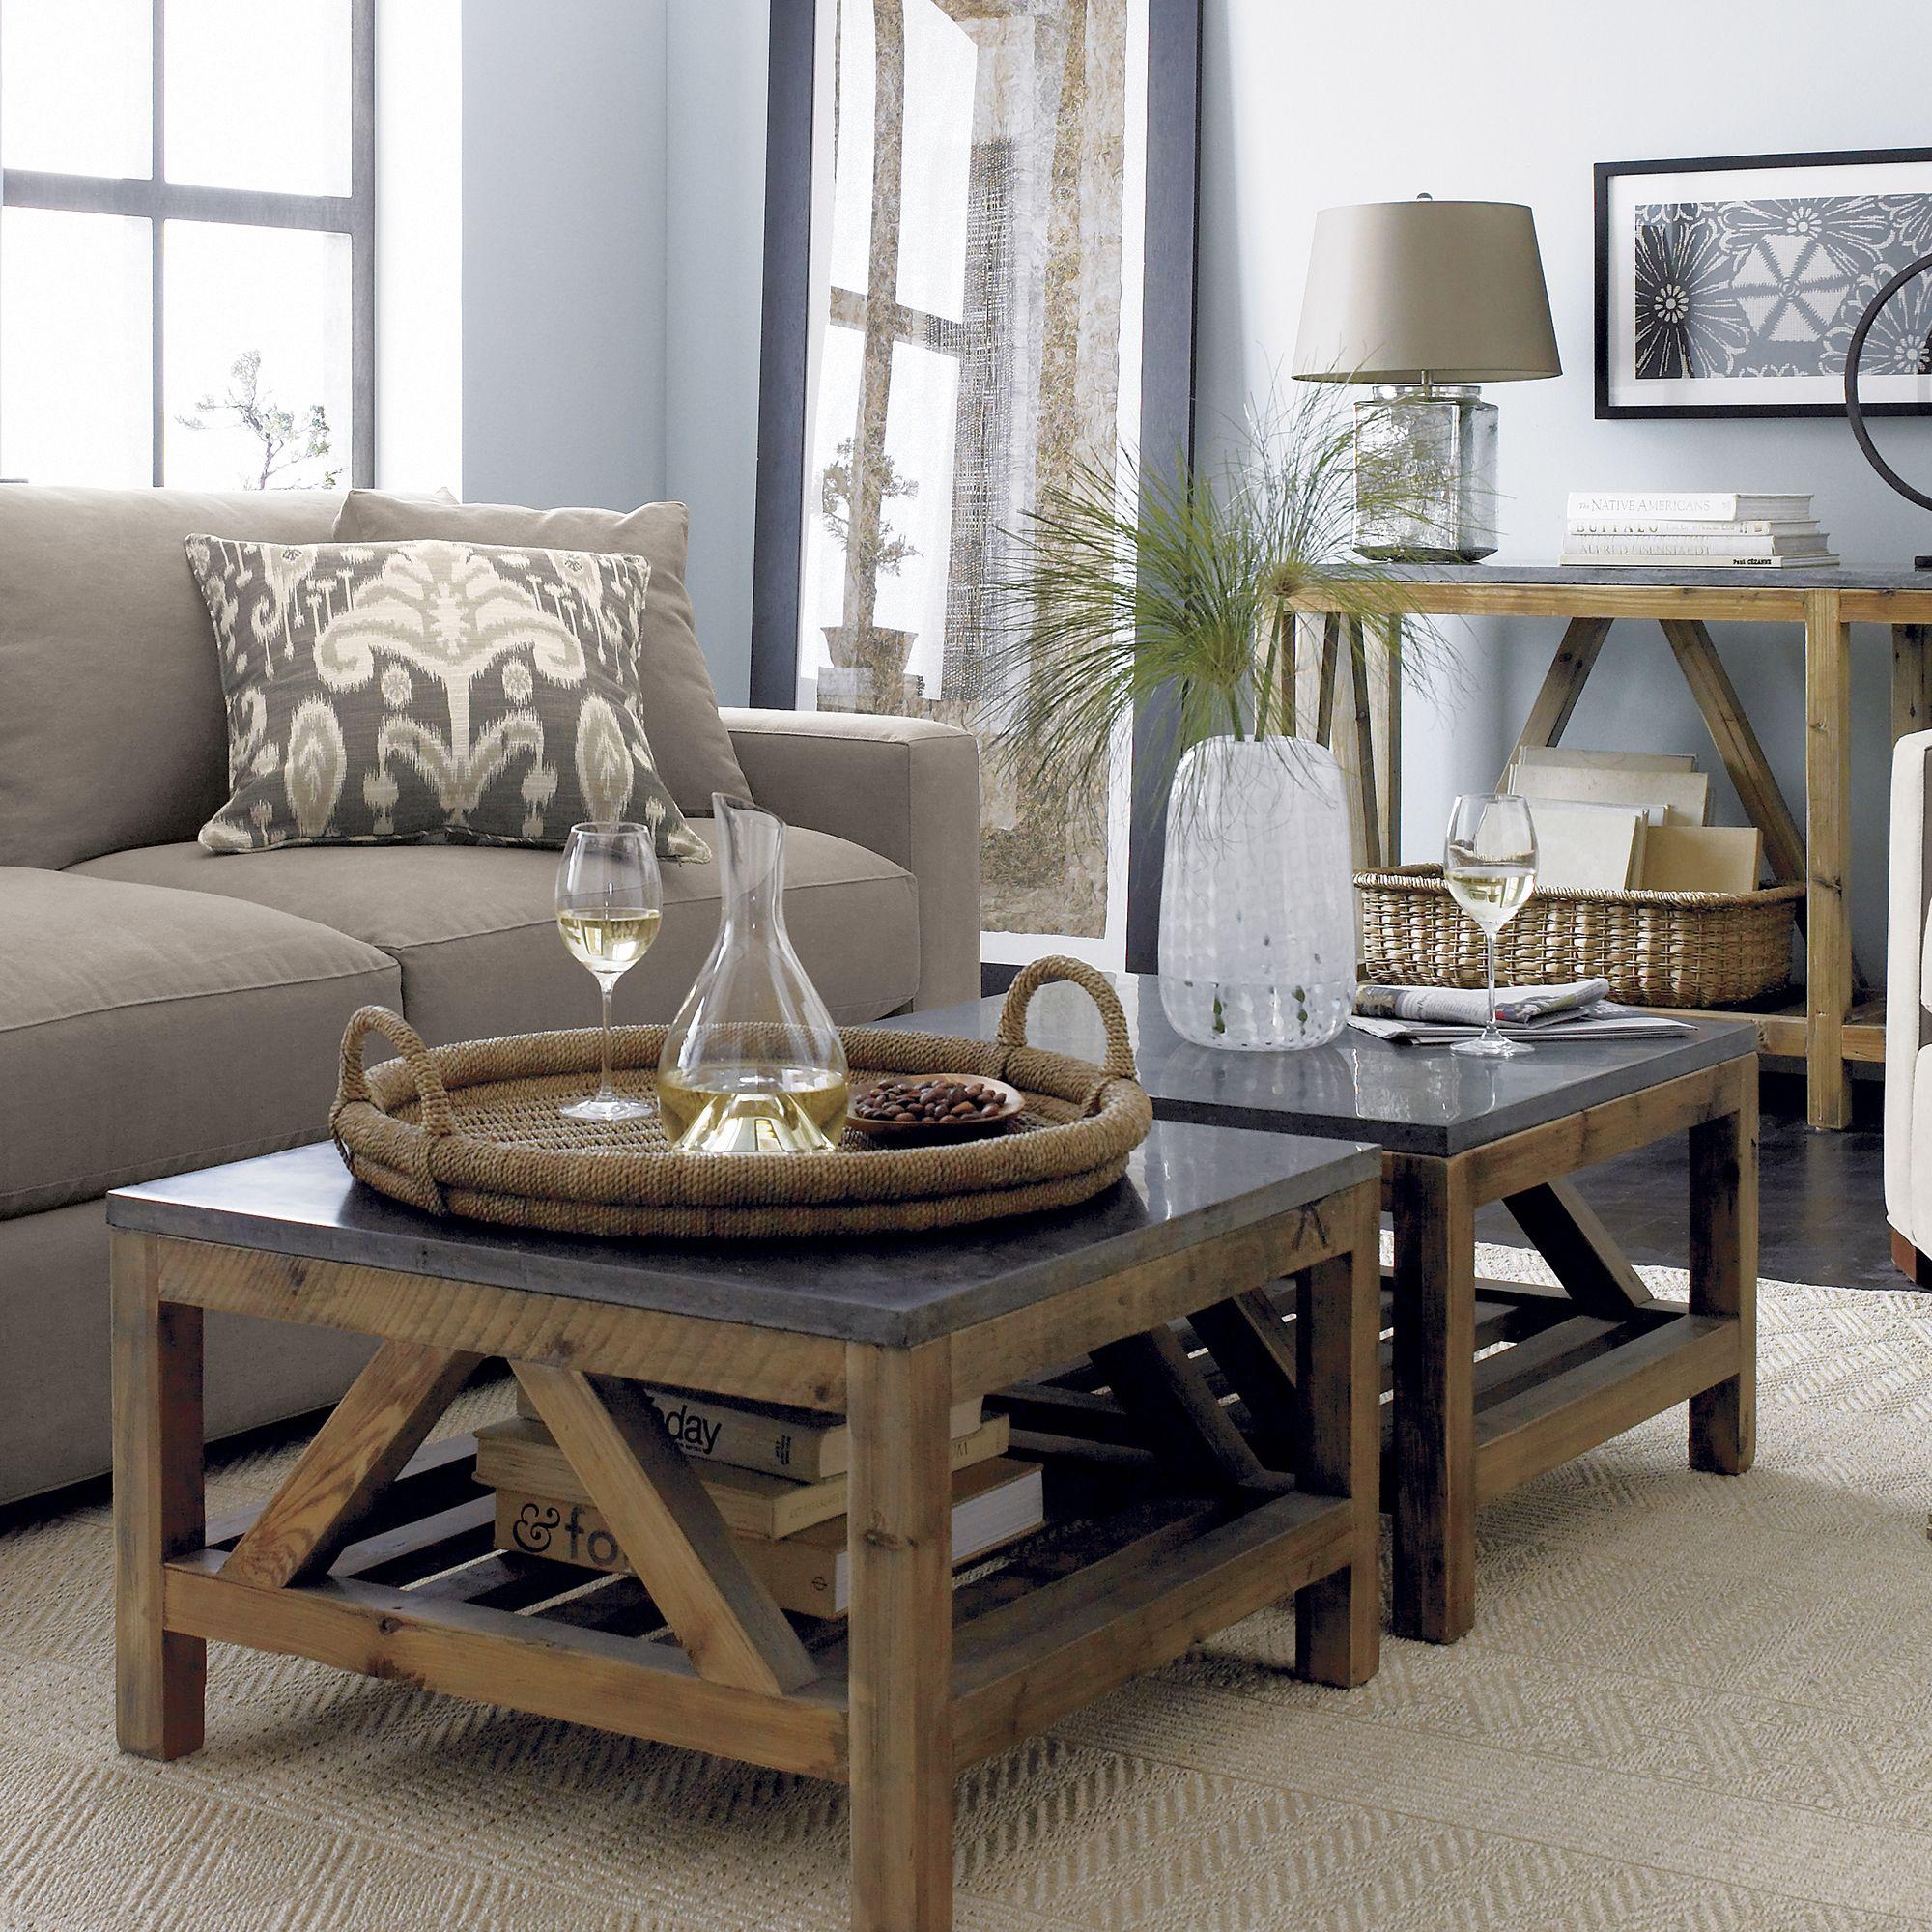 Bluestone square coffee table modern farmhouse